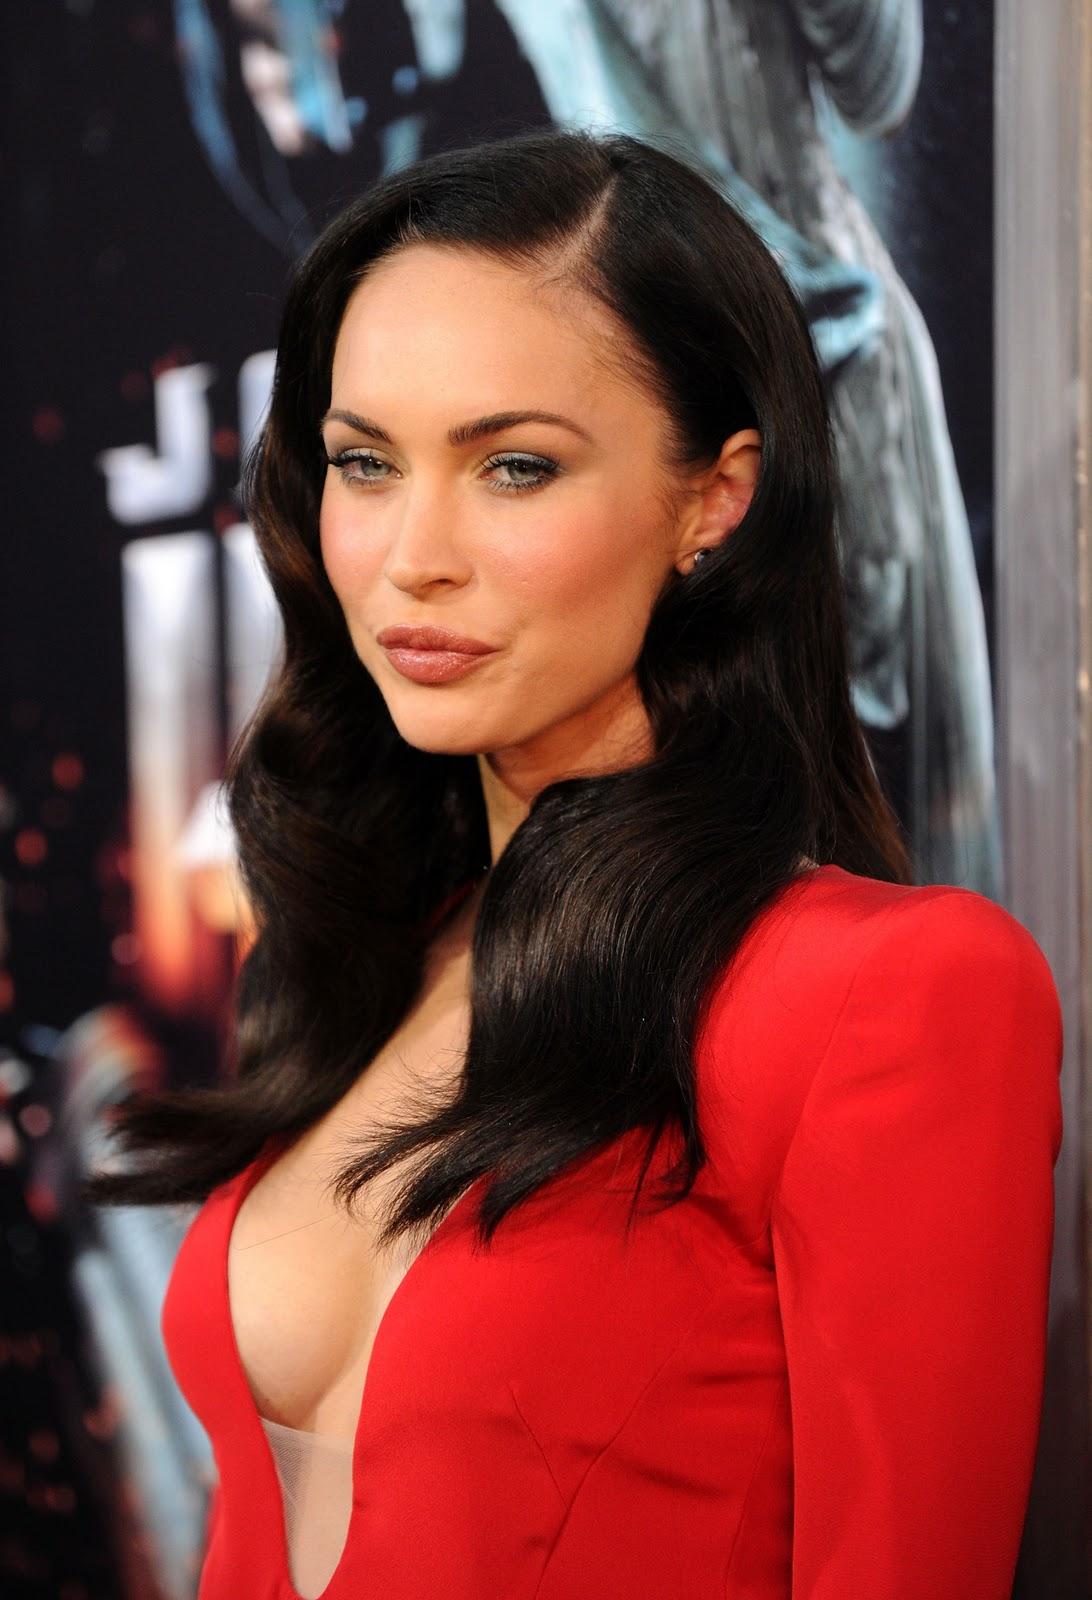 http://2.bp.blogspot.com/-P8D7CbB0ujk/Typ8fKjgB1I/AAAAAAAABPo/xzLU7--6H18/s1600/Megan_Fox_Jonah_Hex_Premiere----www.malluclips.net+%283%29.jpg